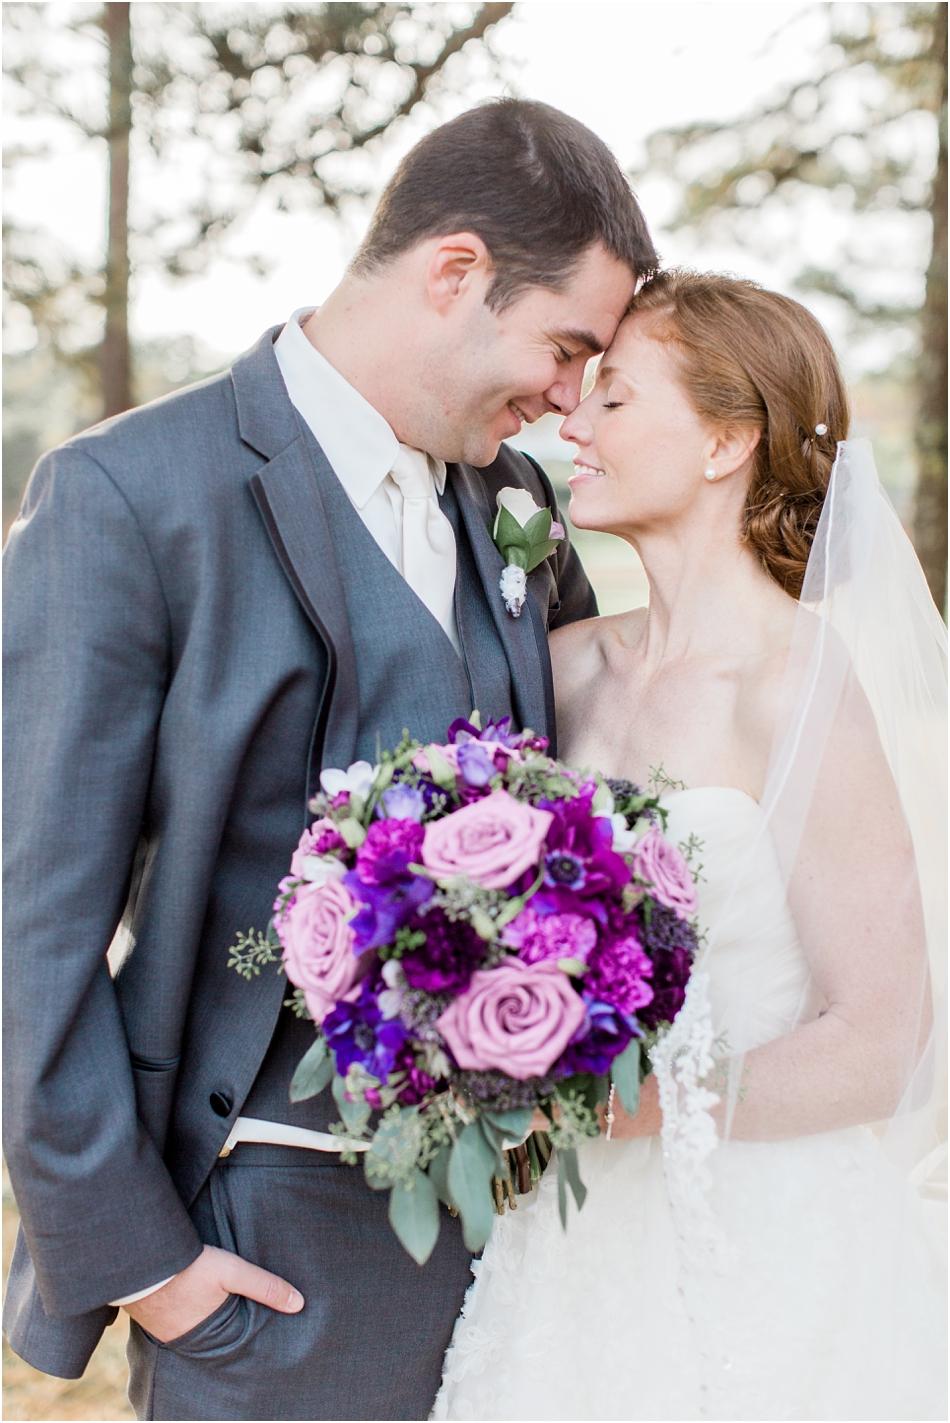 willowbend_megan_david_country_club_cape_cod_boston_new_england_wedding_photographer_Meredith_Jane_Photography_photo_0202.jpg